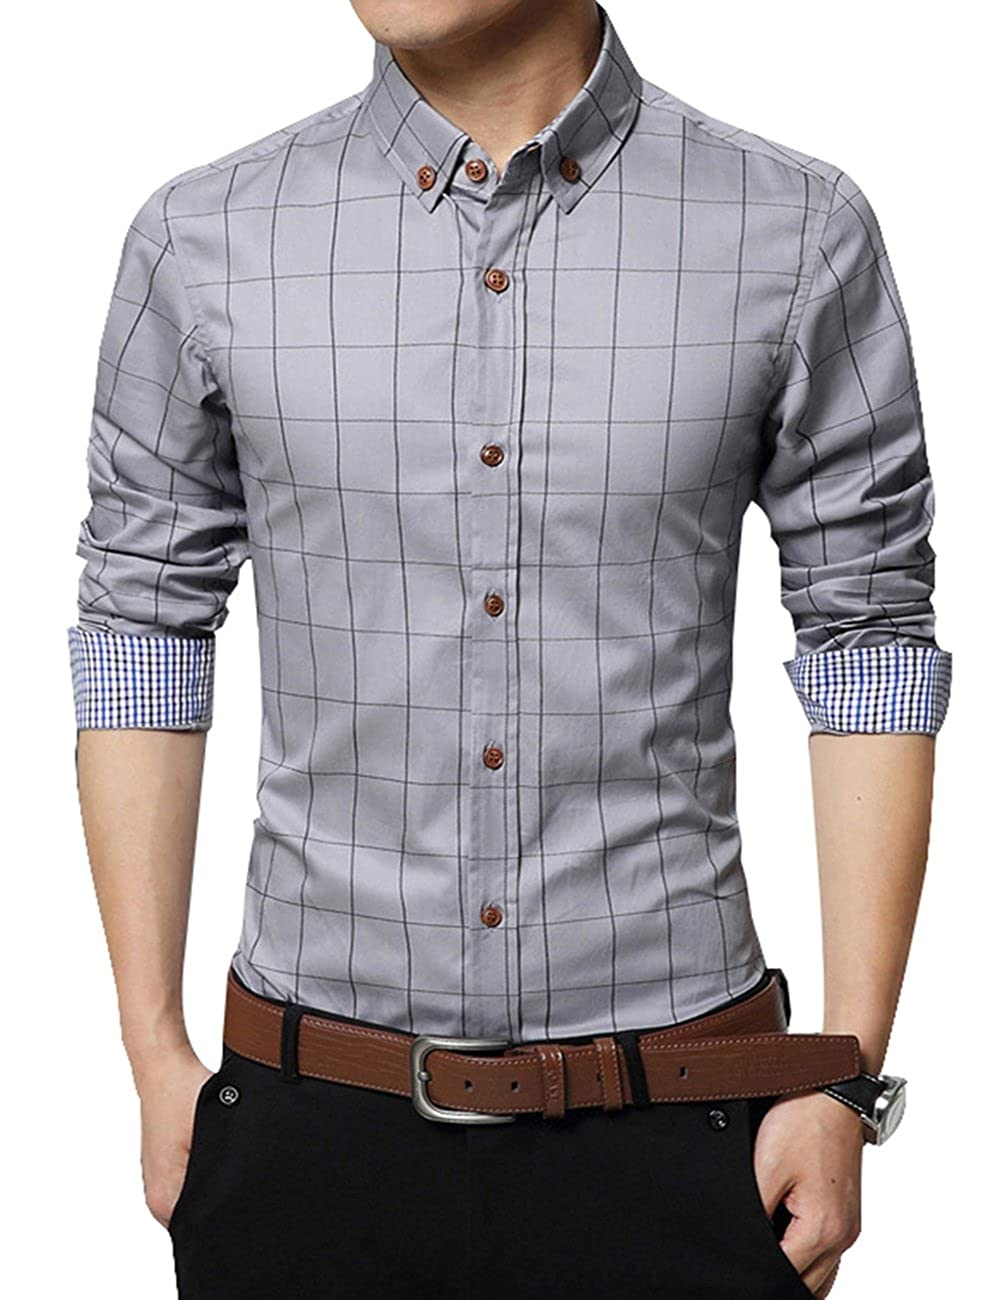 Erztiay Mens Formal Business Plaid Slim Fit Long Sleeve Dress